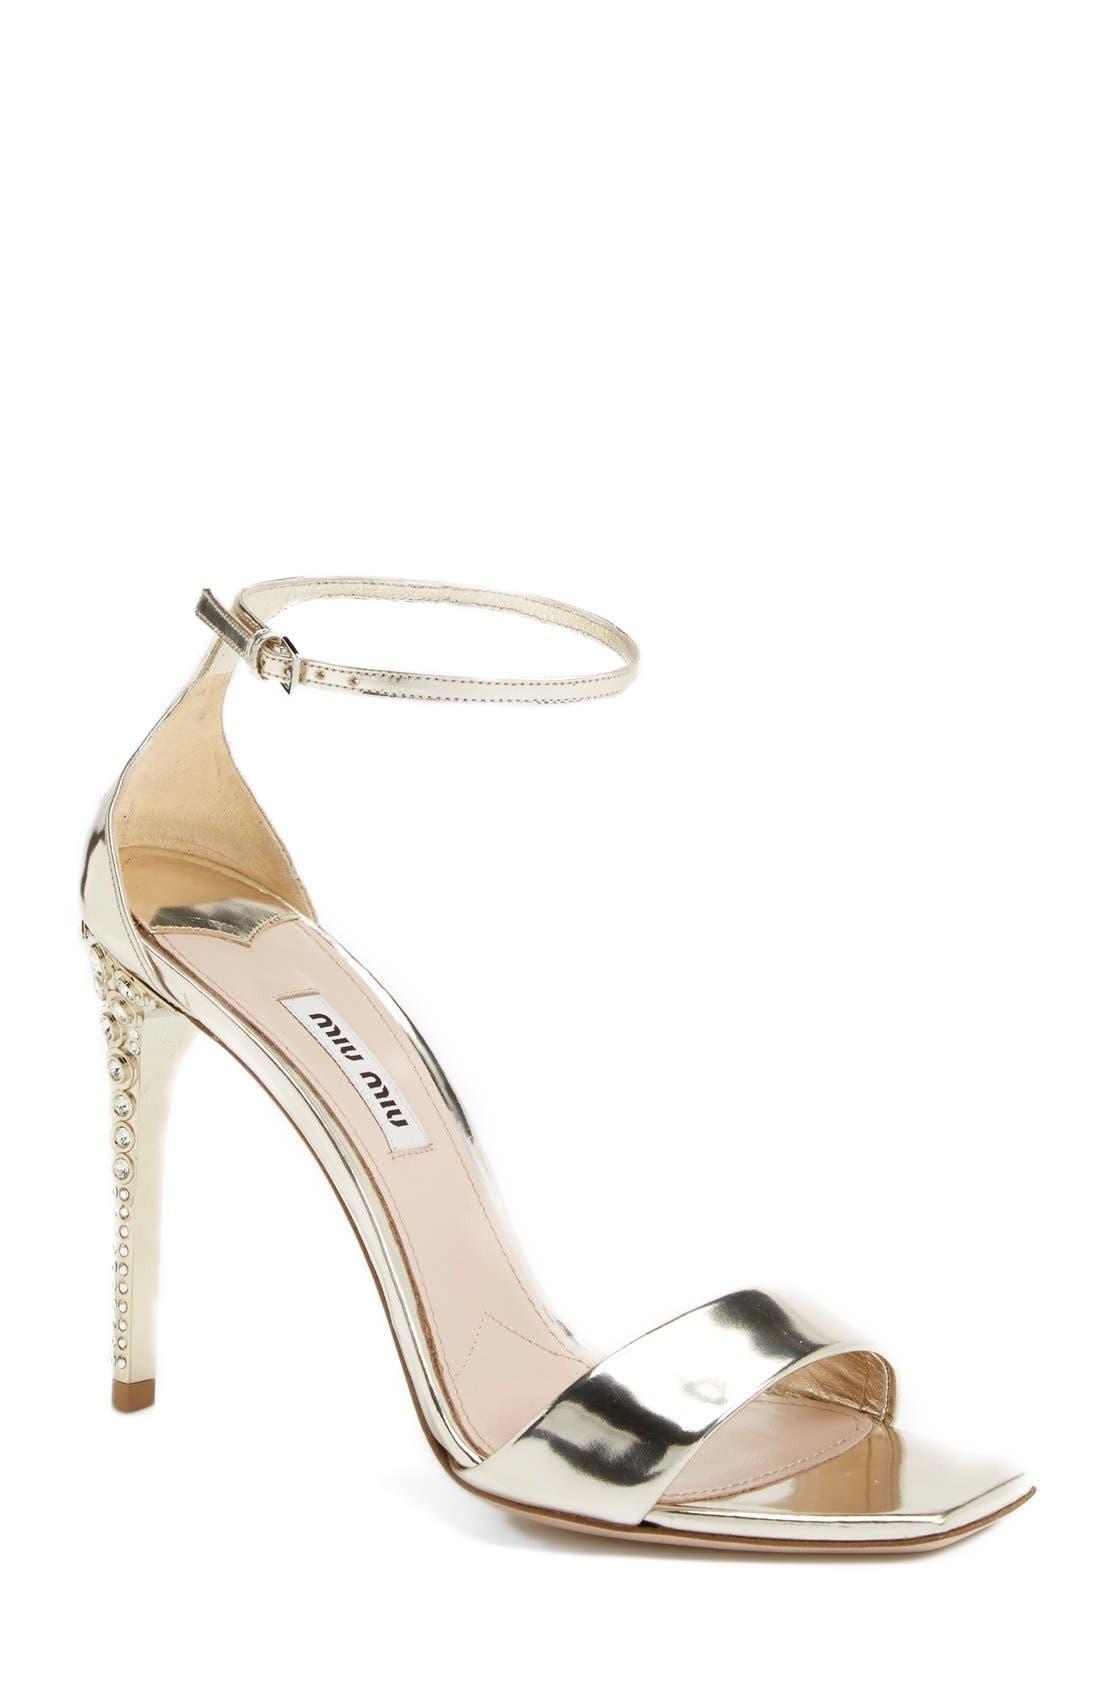 Main Image - Miu Miu Metallic Ankle Strap Sandal (Women)